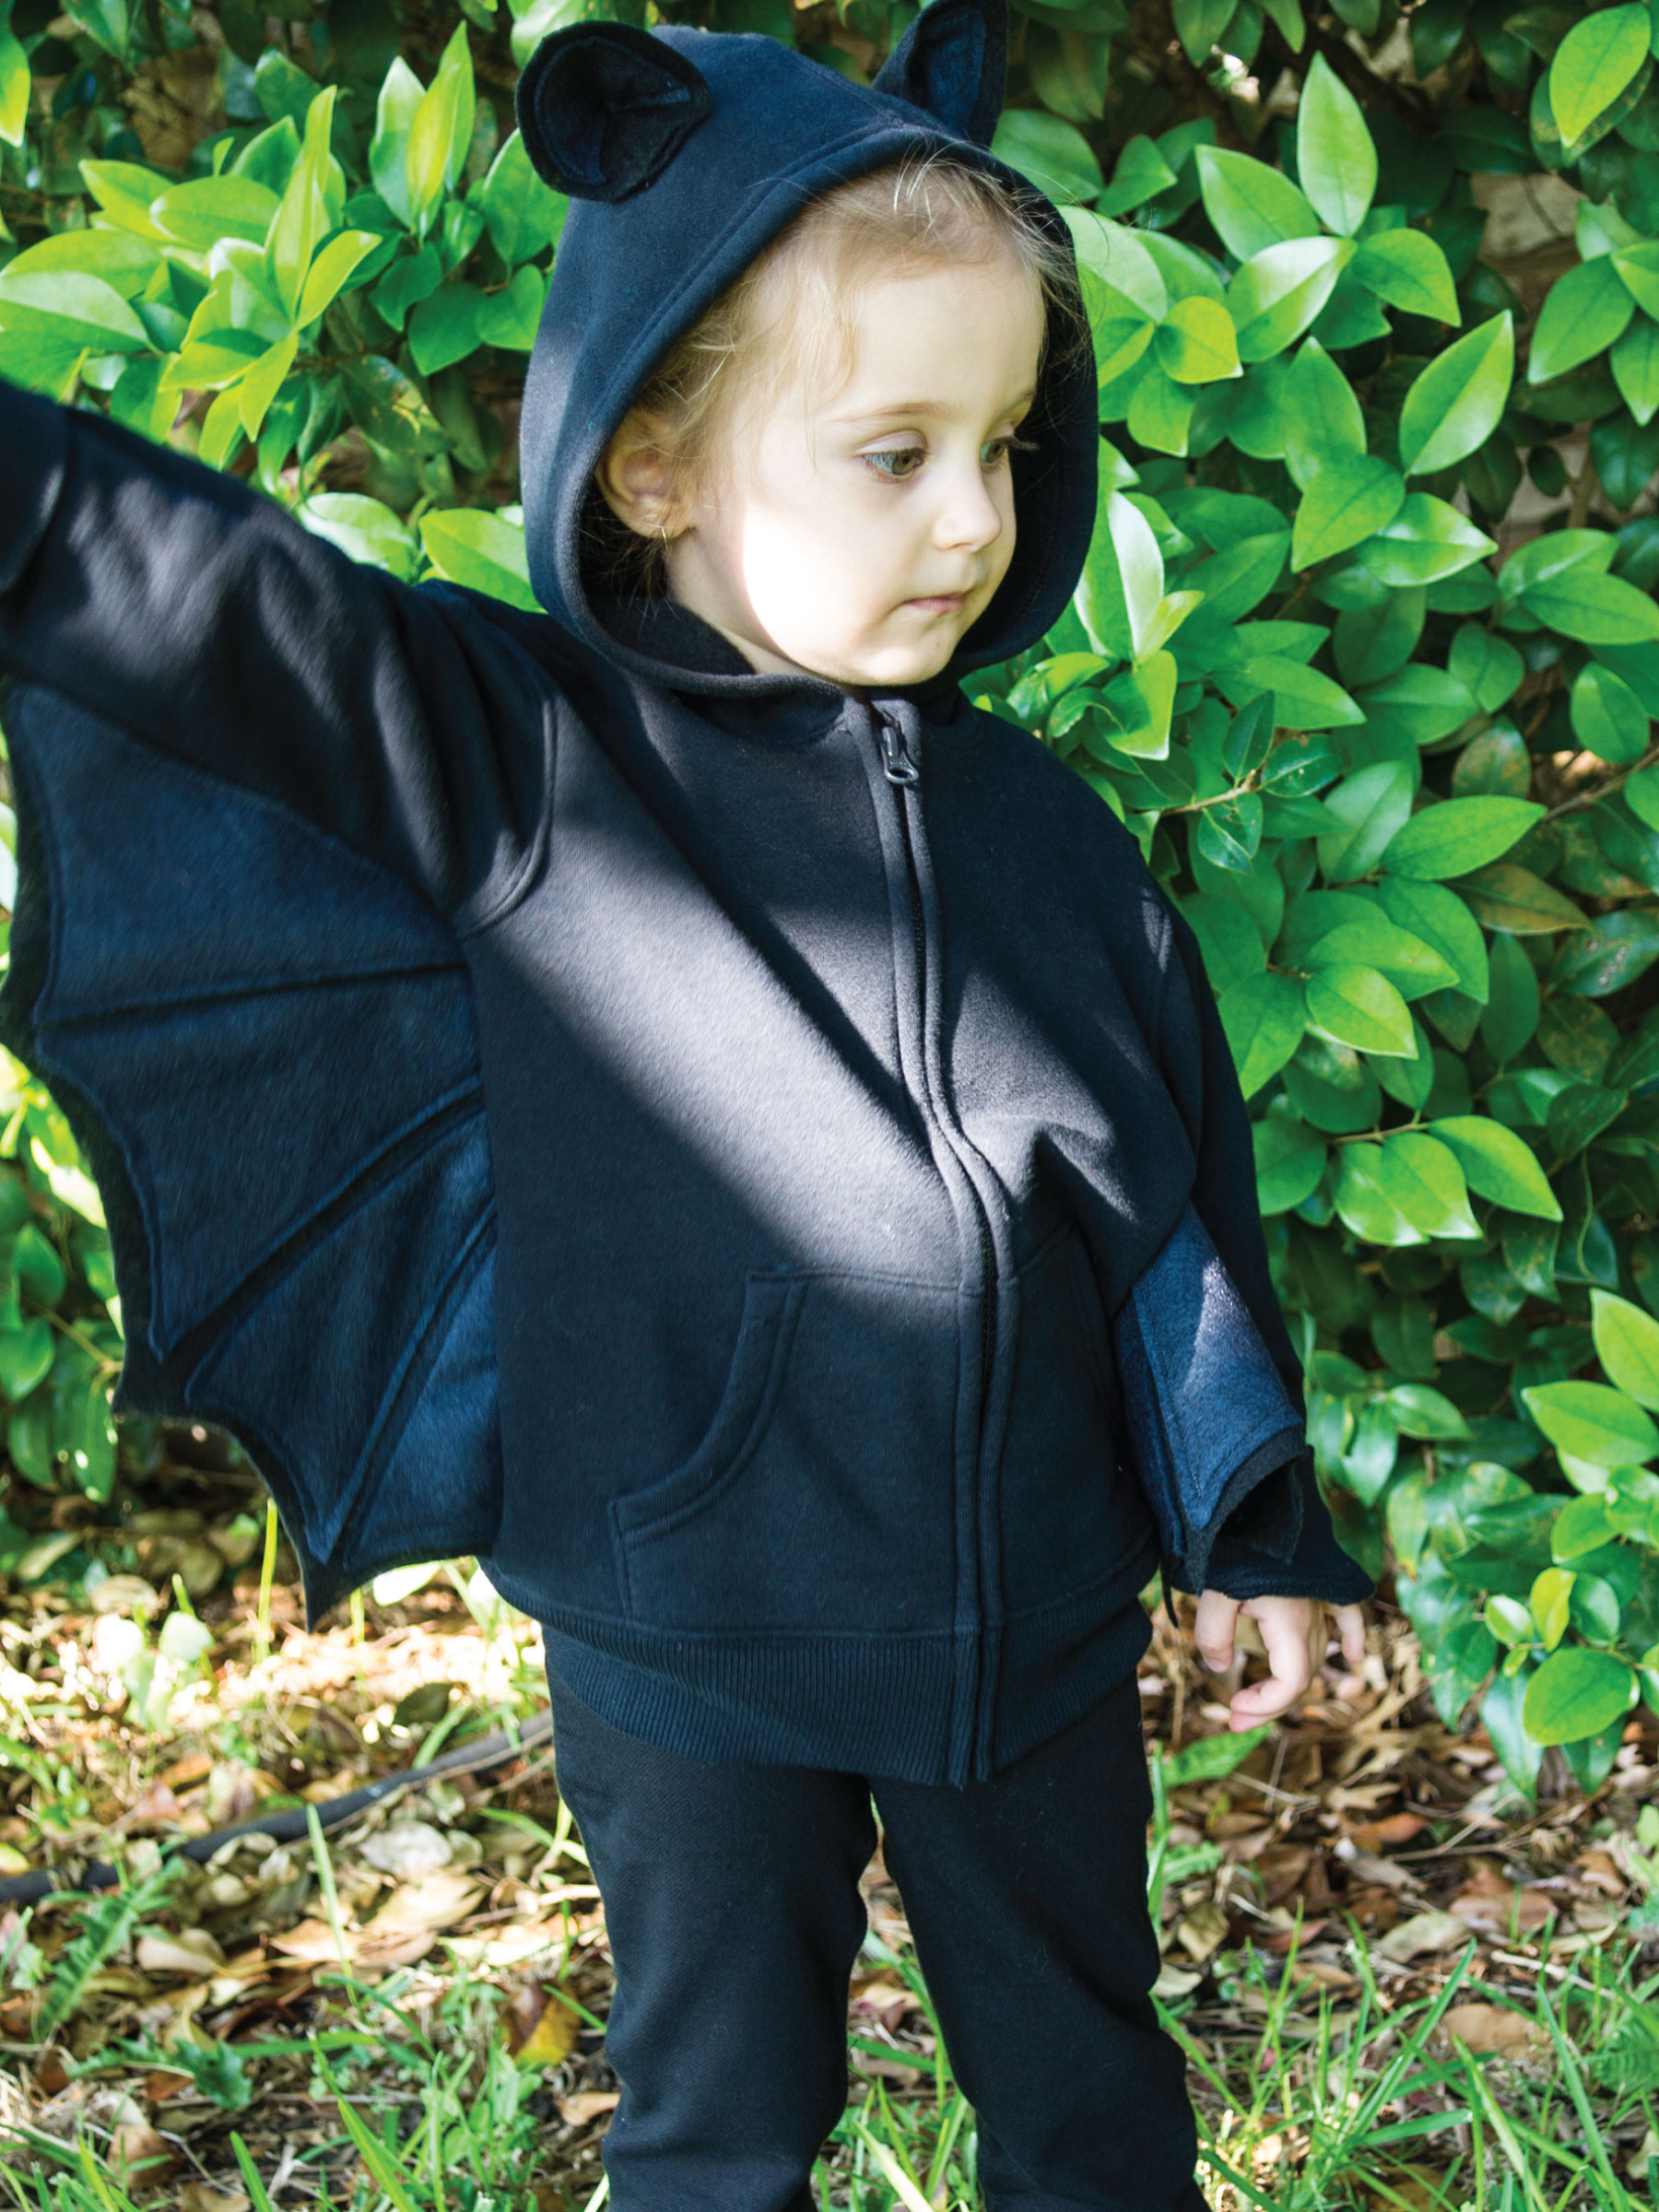 Kid's Hoodie Bat Costume by Sam Henderson of Today's Nest for HGTV